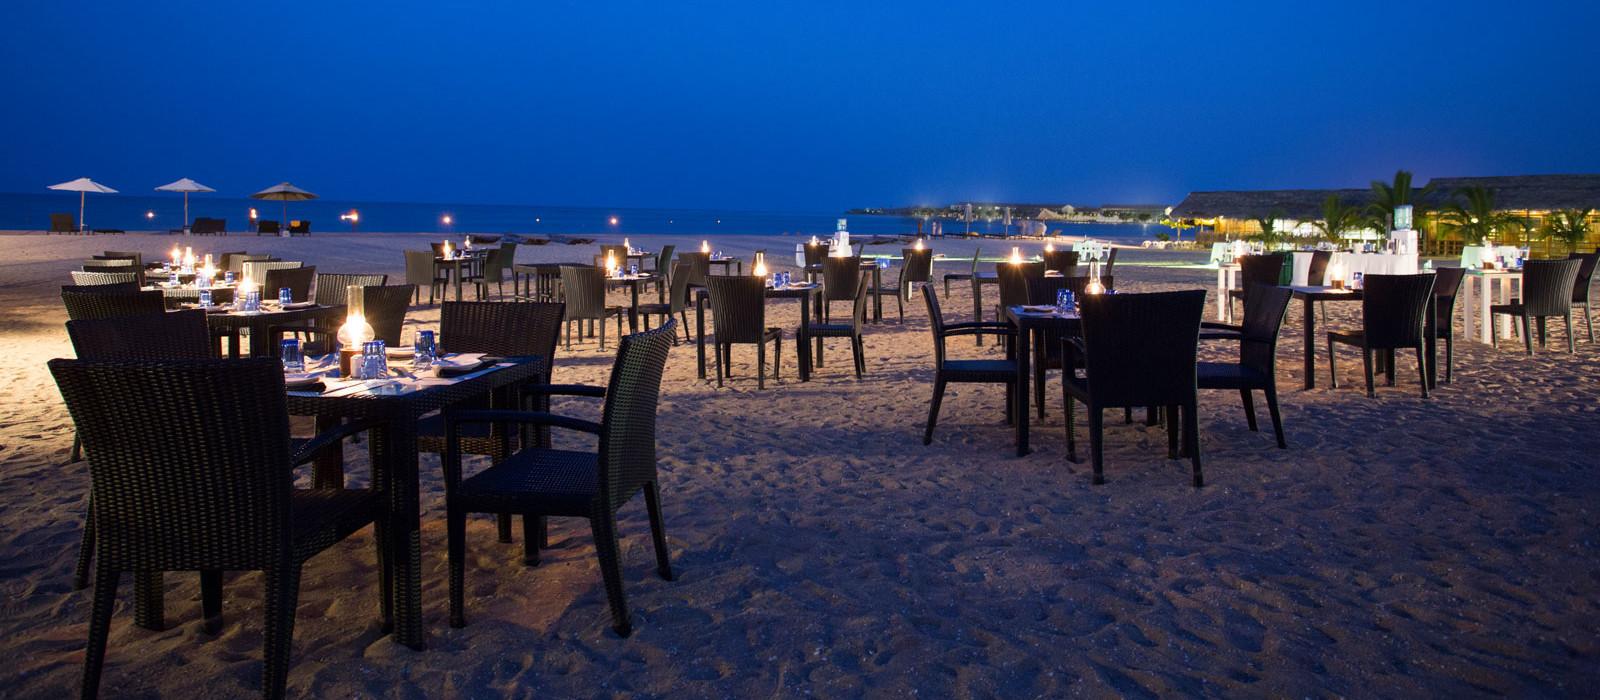 Hotel Pasikudah, Maalu Maalu Resort & Spa Sri Lanka